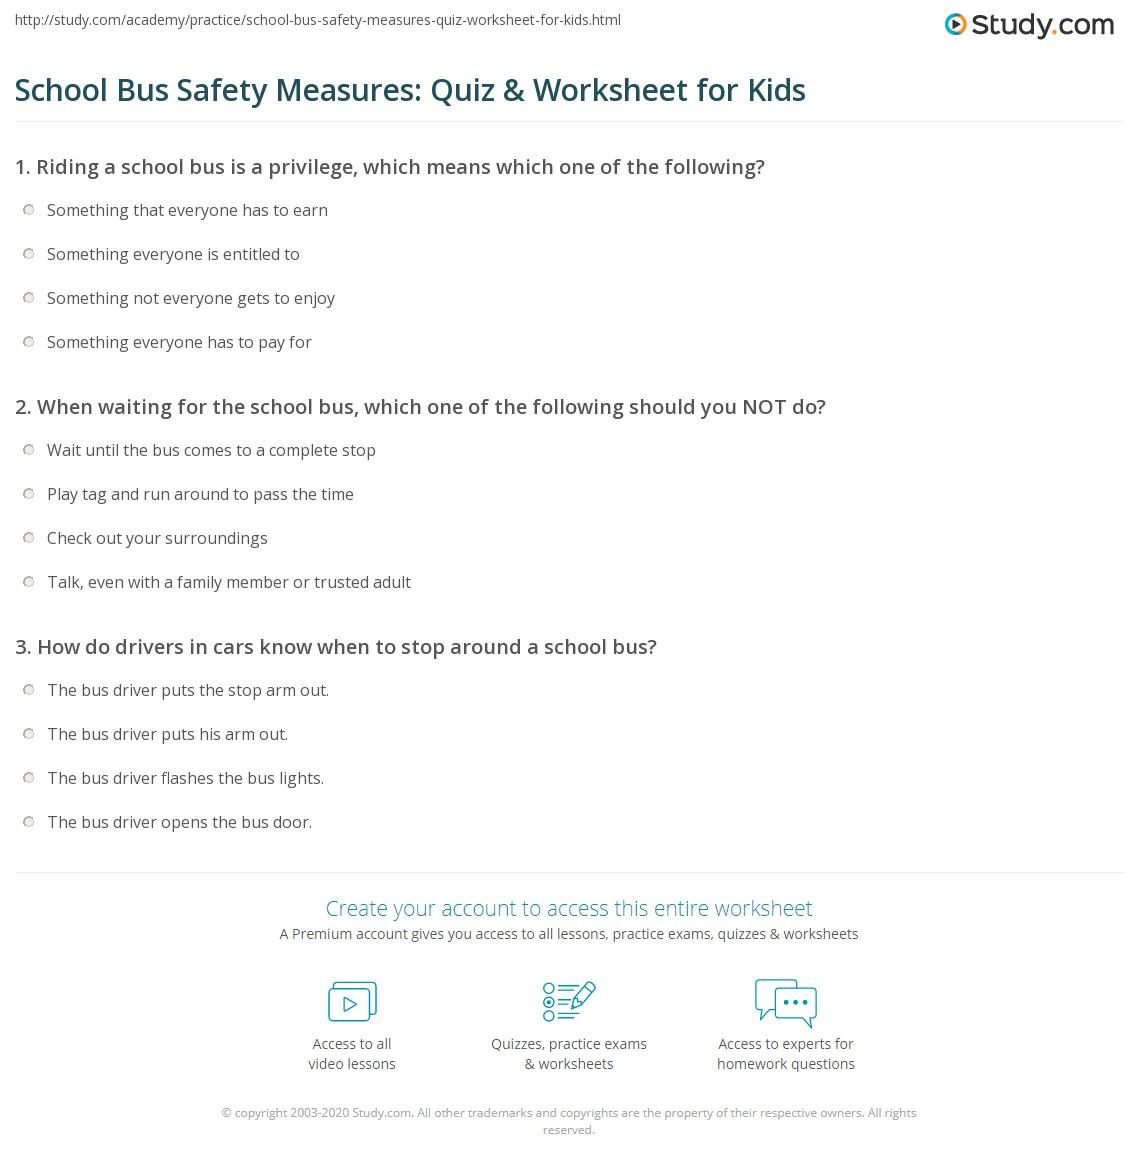 School Bus Safety Measures: Quiz & Worksheet for Kids | Study.com